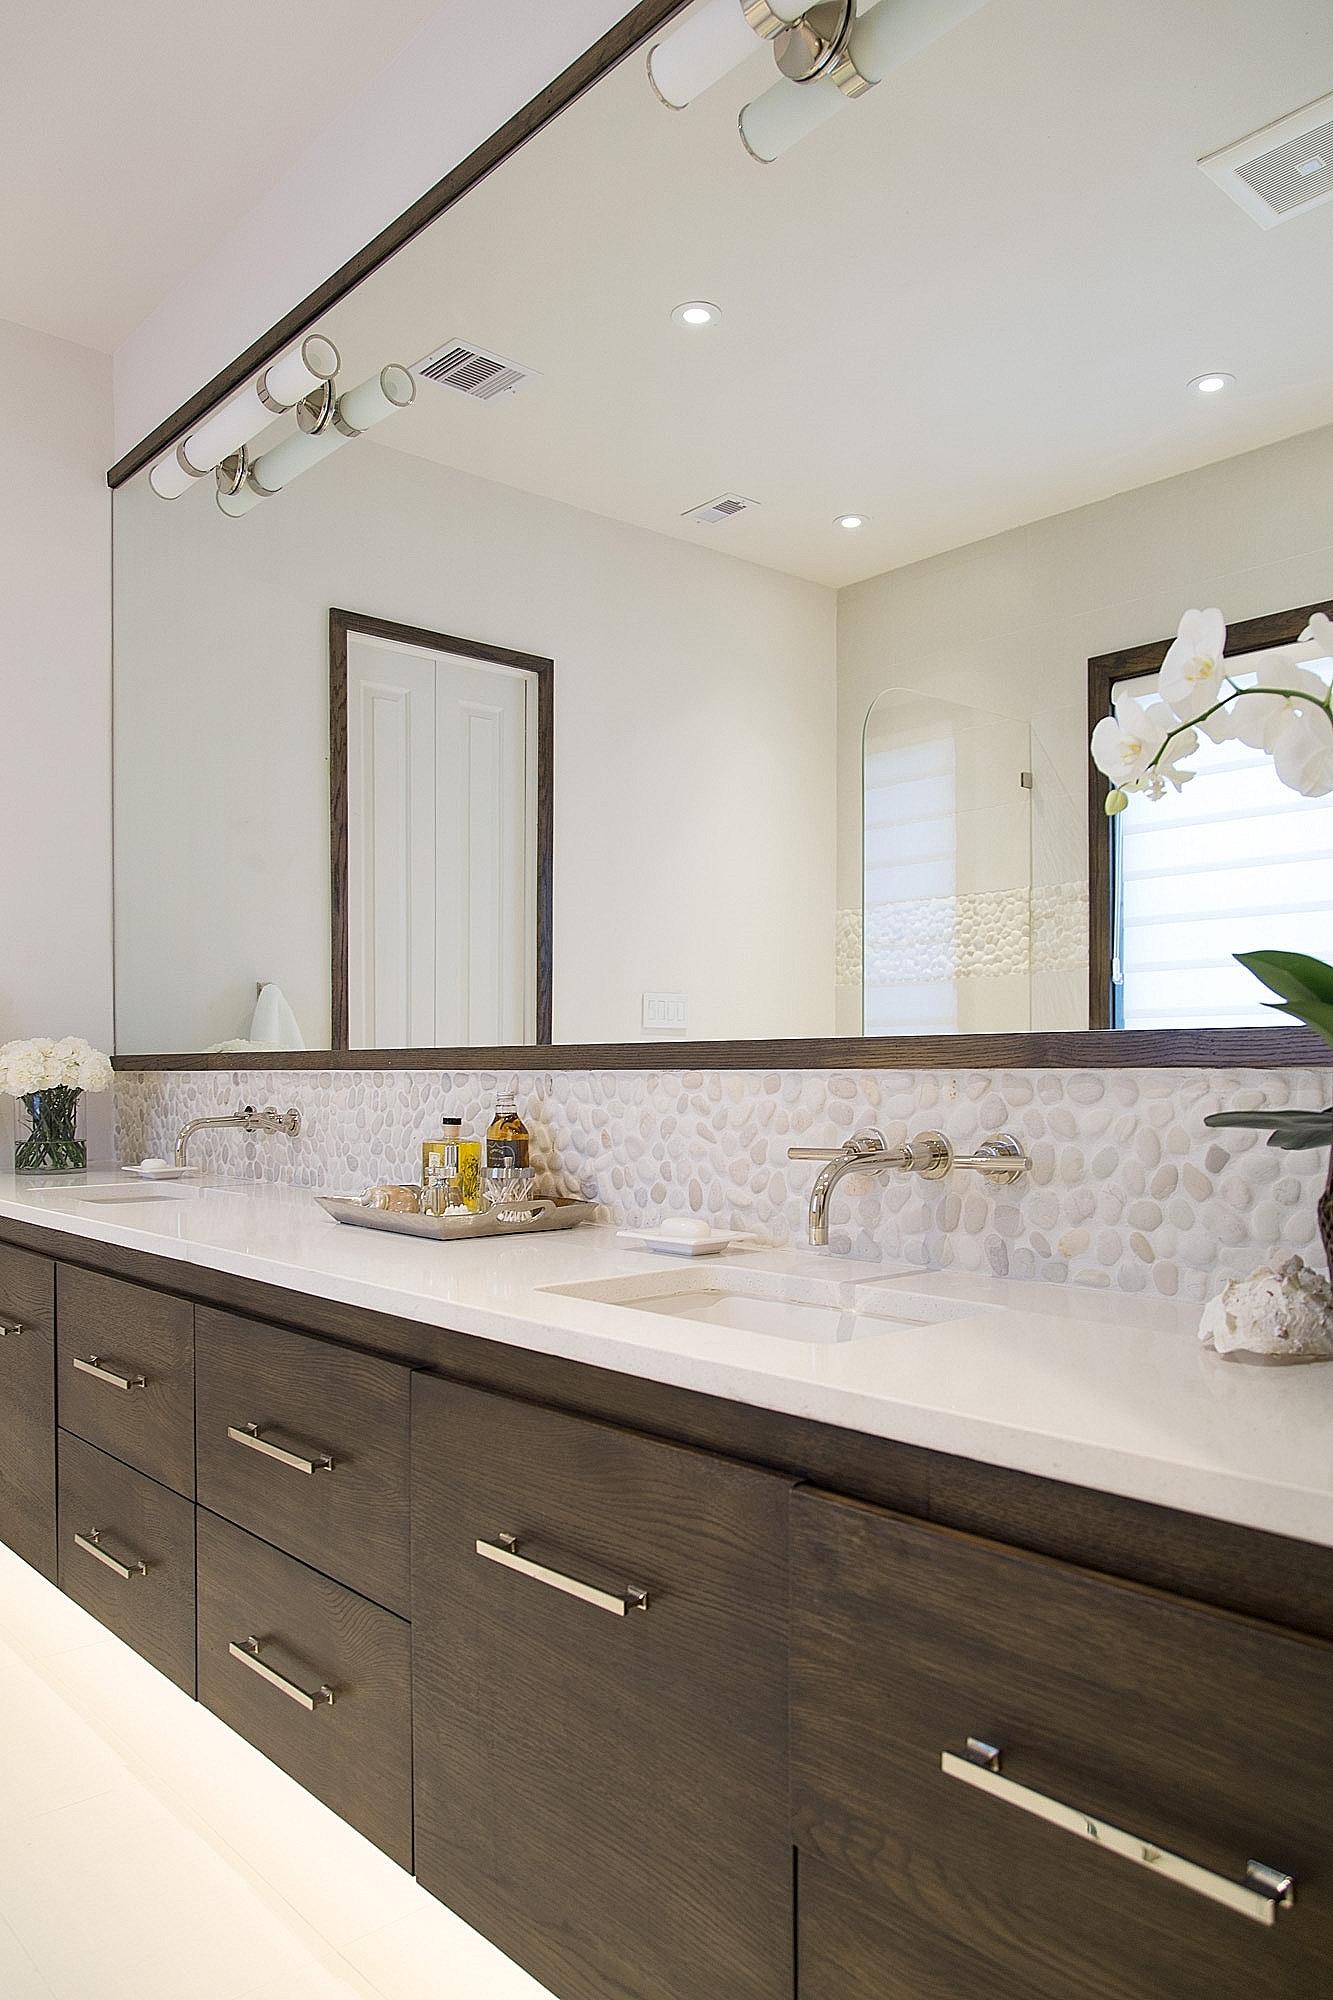 Master bathroom remodel with floating wood vanity and pebble tile backsplash. | Interior Designer: Carla Aston / Photographer: Tori Aston #bathroomideas #bathroomremodel #floatingvanity #bathroomvanity #pebbletile